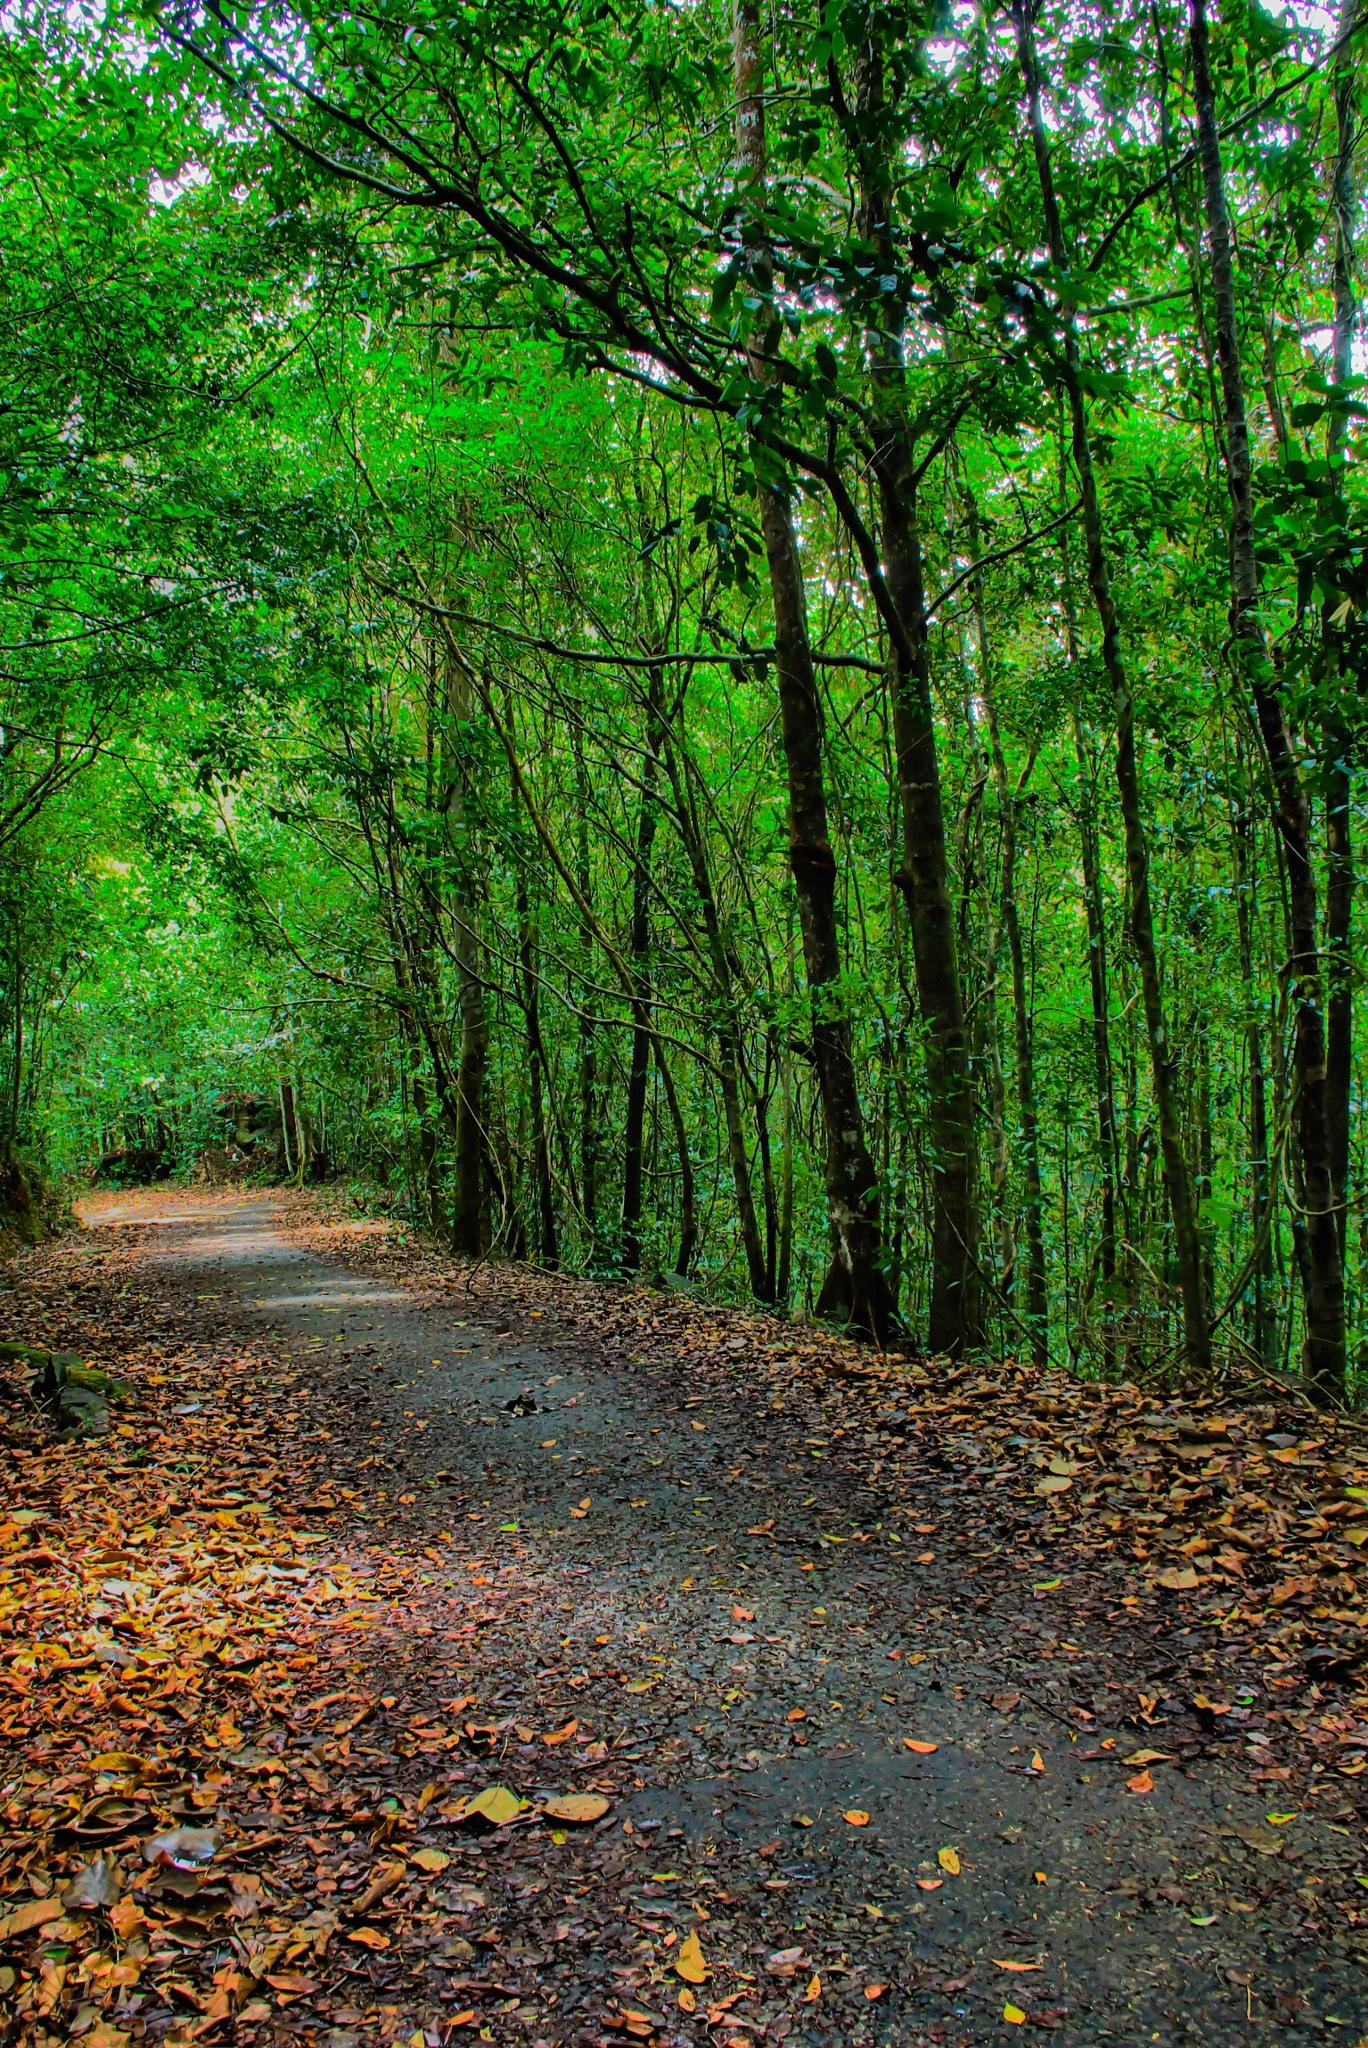 Green Road  by Vihanga Withanage